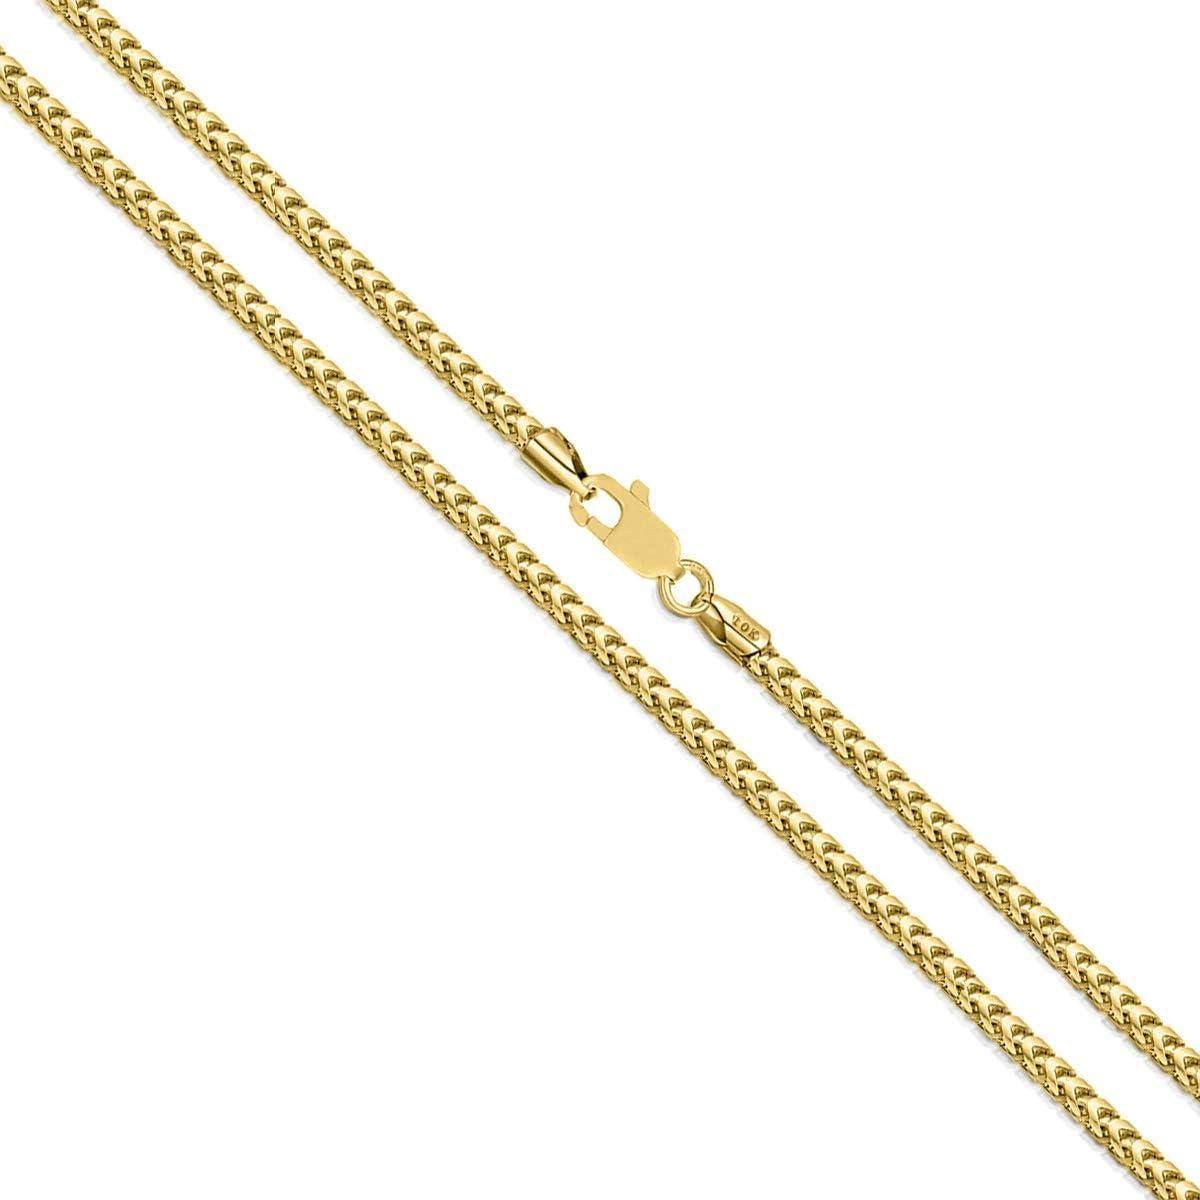 Orostar 10K Yellow Gold 1.5MM Diamond Cut Square Franco Chain Necklace, 16